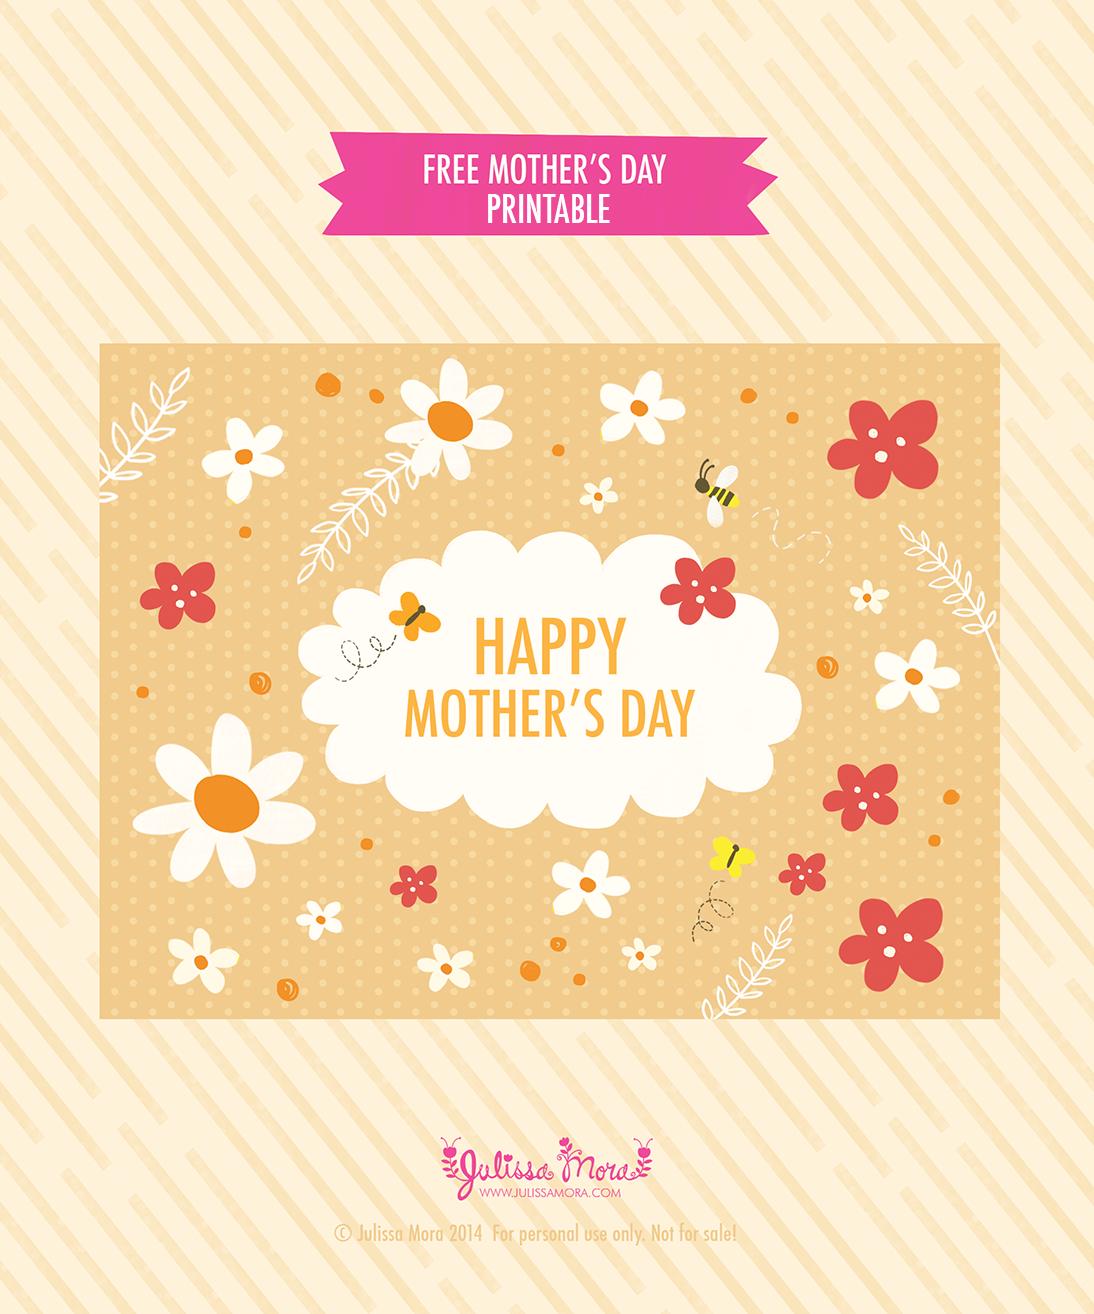 http://2.bp.blogspot.com/-JukkO3W4Hh4/U2OfT-ukgkI/AAAAAAAAB18/ckxxTu1Fm98/s1600/Mother's+Day.png